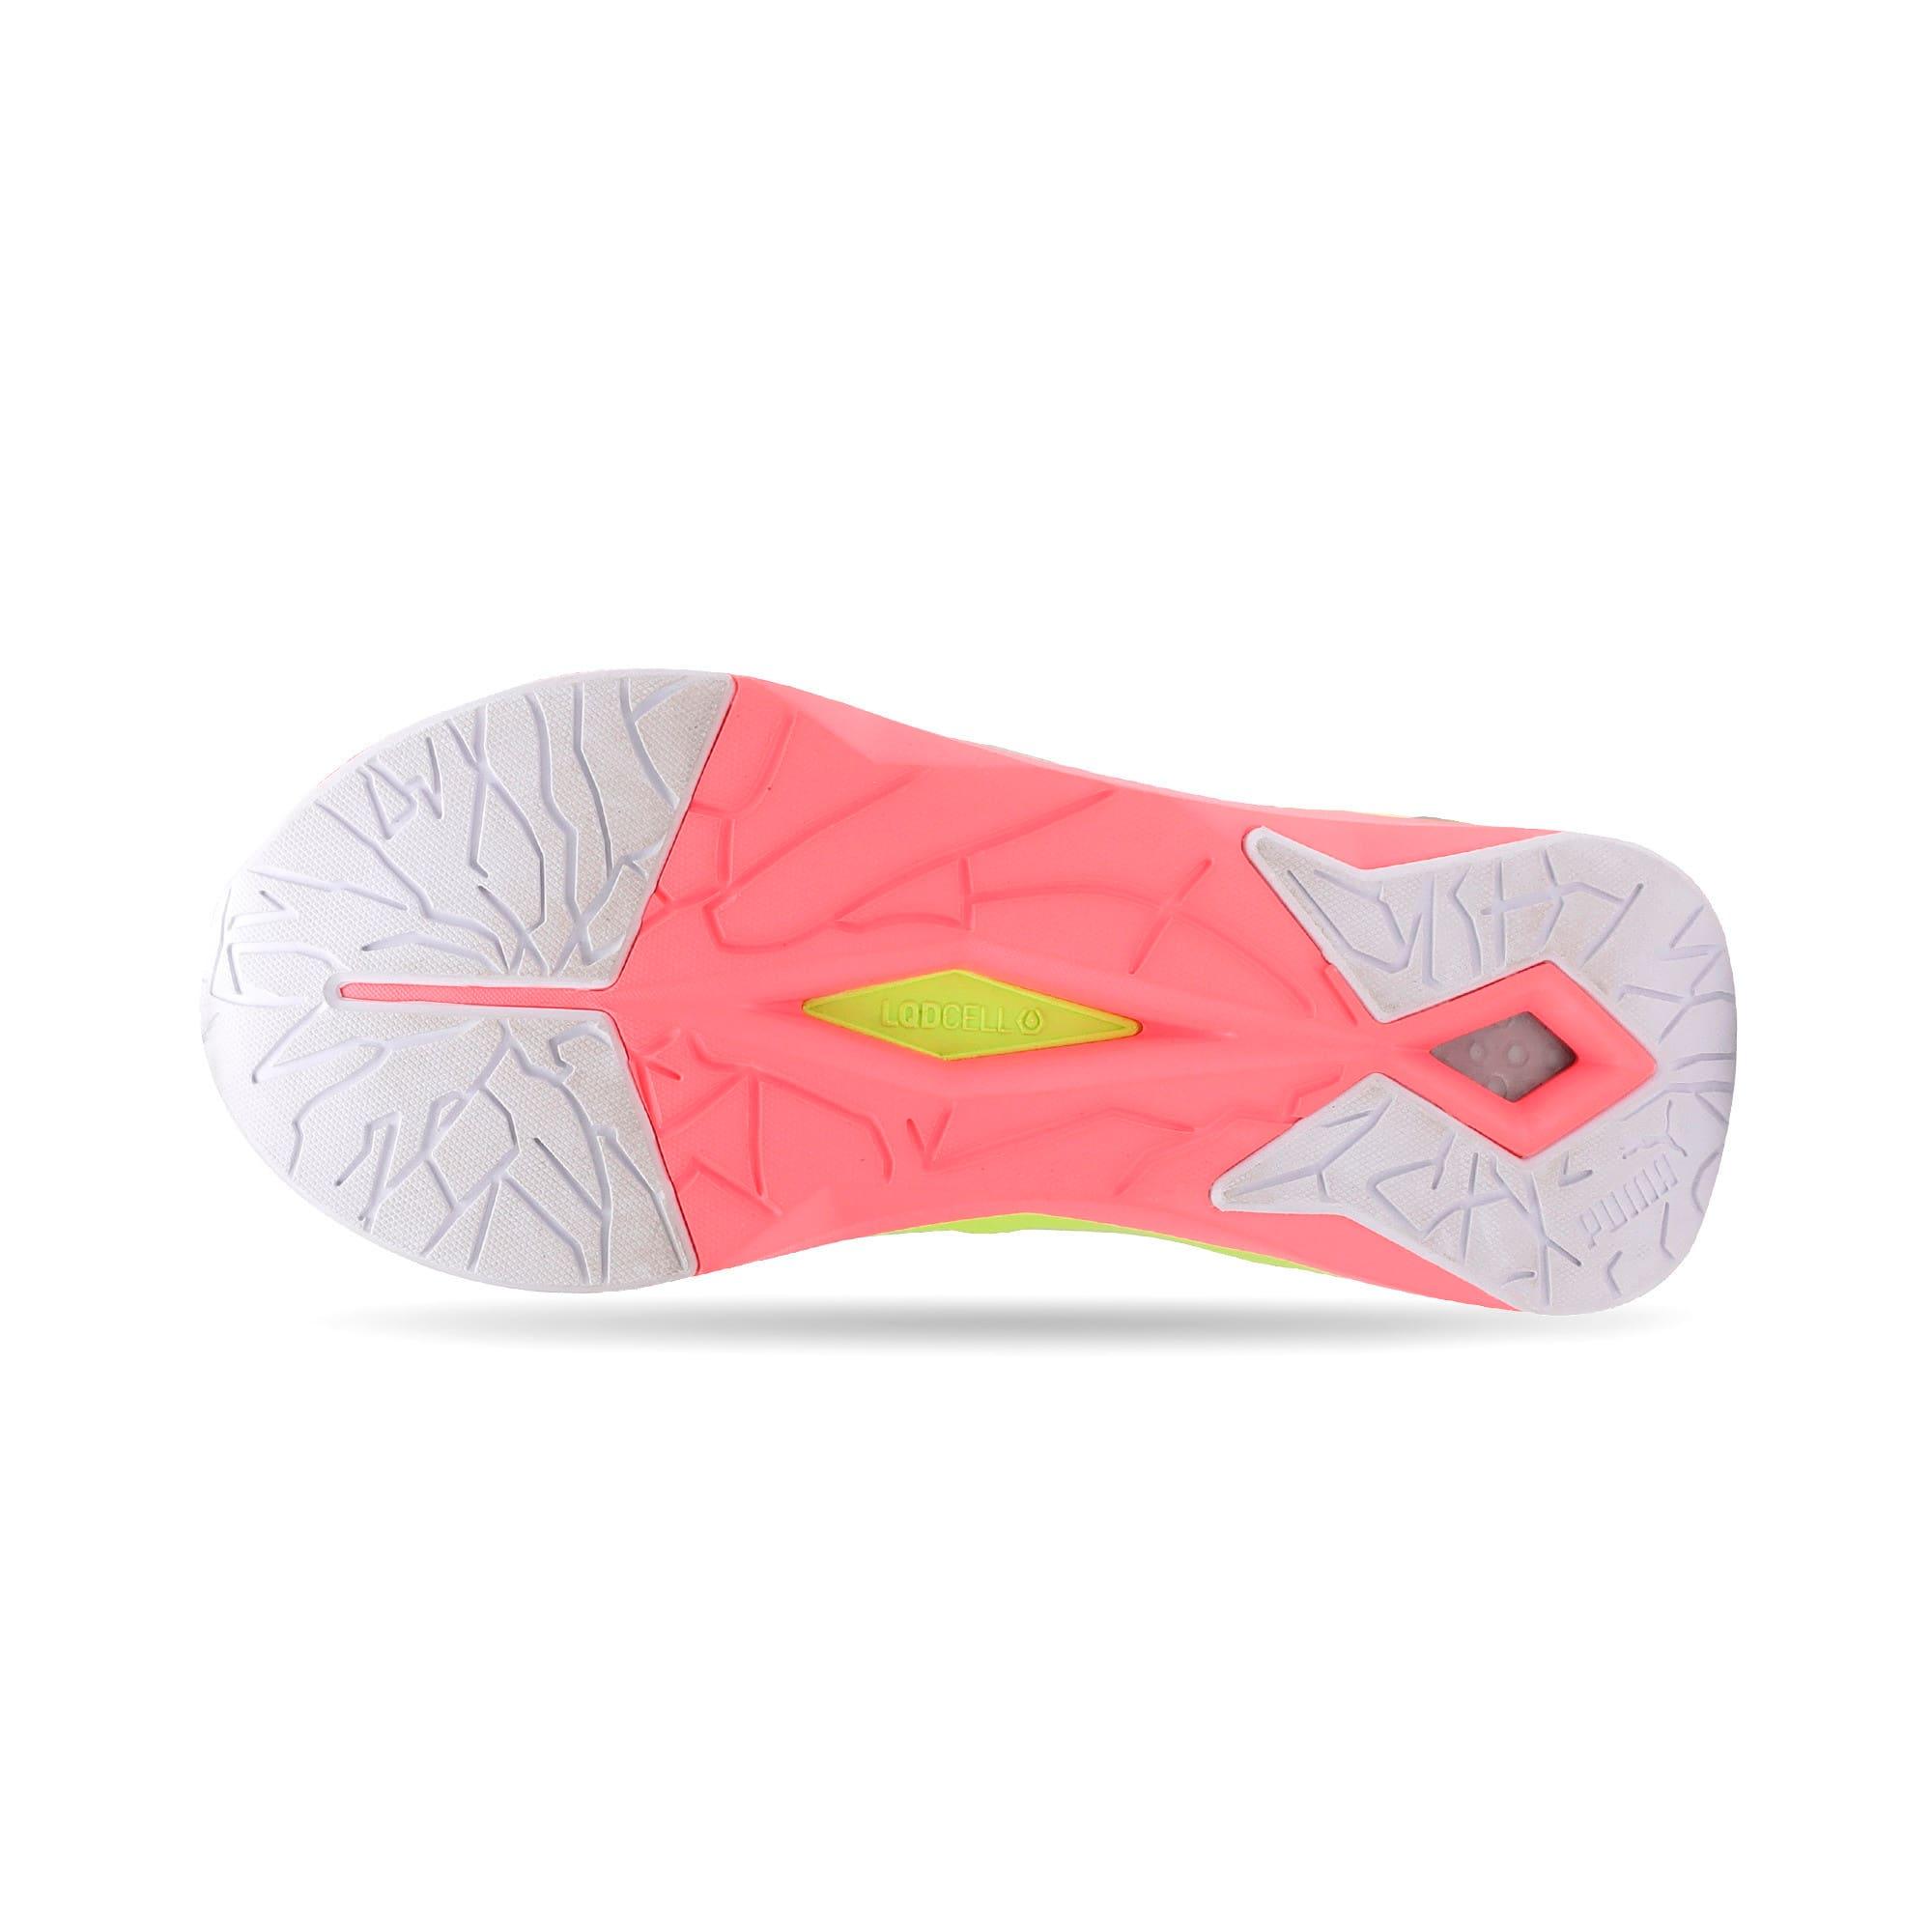 Thumbnail 7 of LQDCell Shatter XT Women's Training Shoes, Puma White-Pink Alert, medium-IND